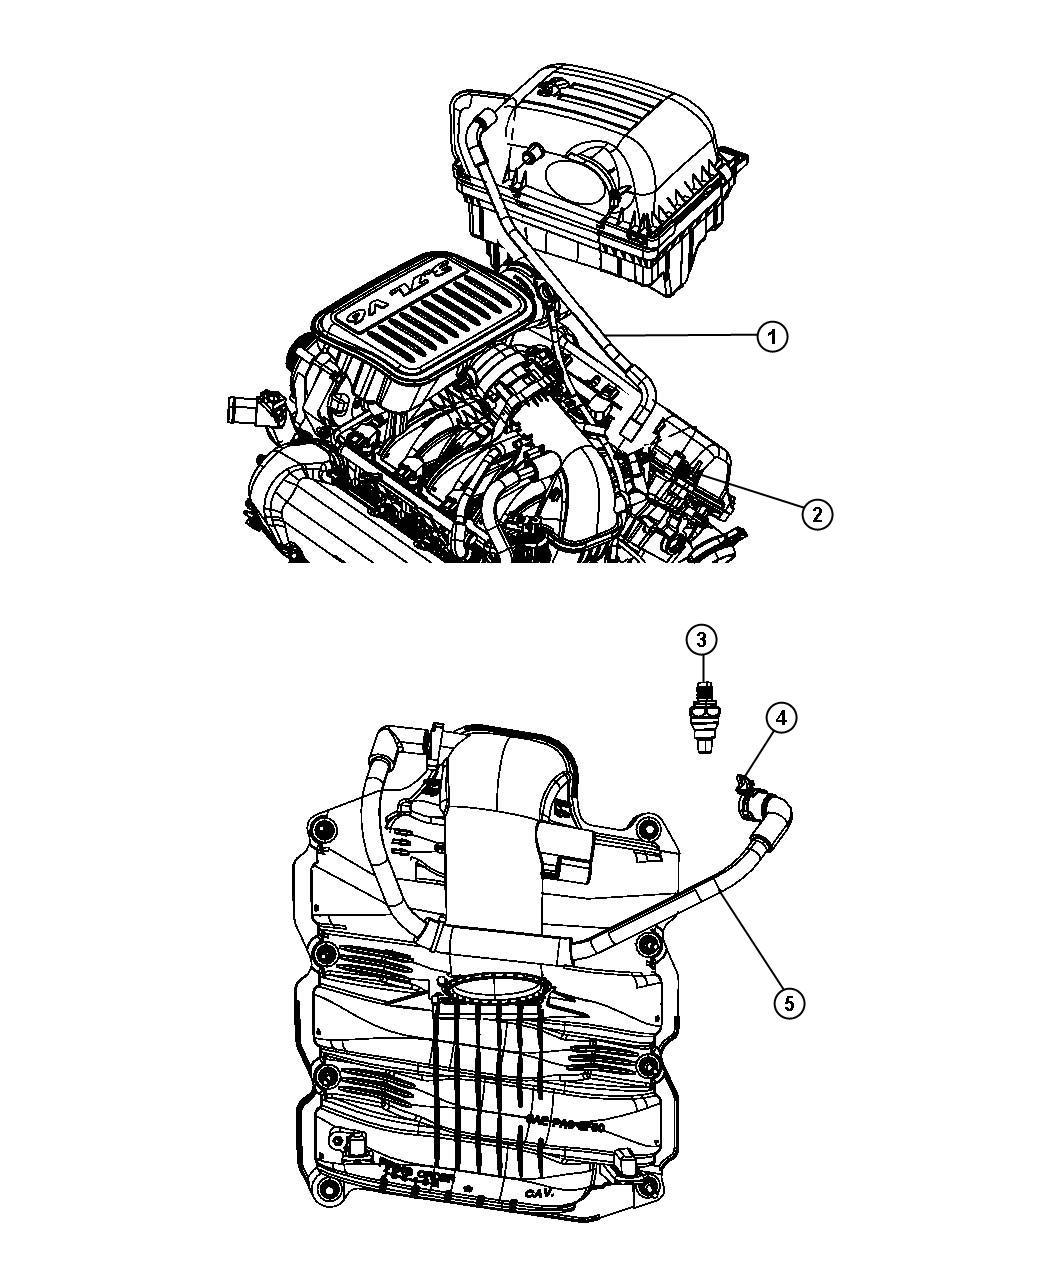 Dodge Nitro Crankcase Ventilation 3 7l 3 7l V6 Engine